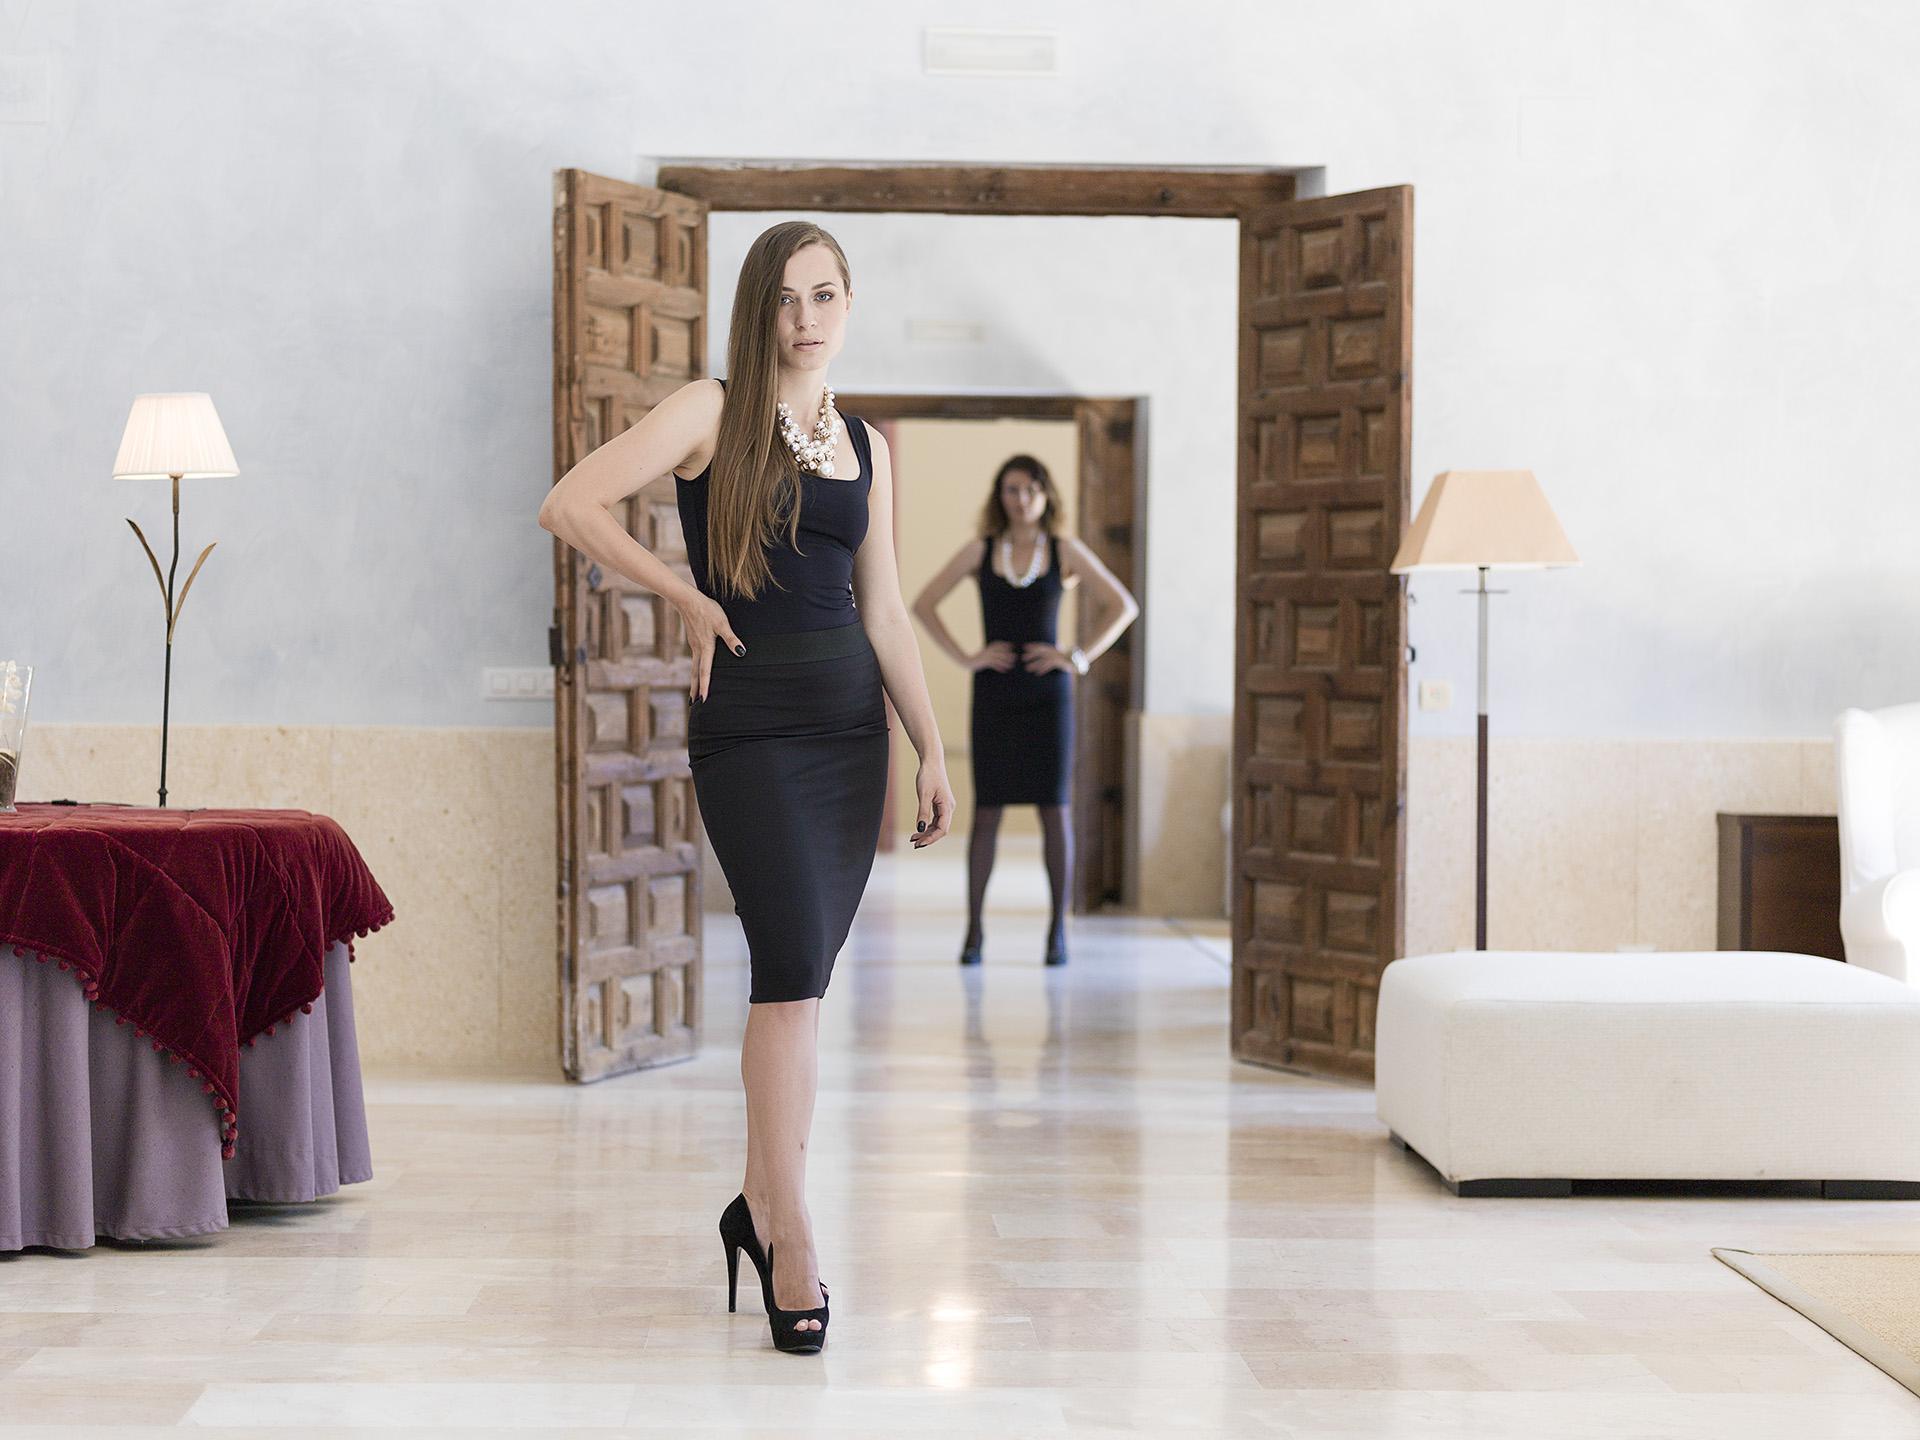 MONASTERIO de RUEDA. Model: Olga Grebenikova und Lena Silk, Bild Eric Berger, Nadja Gusenbauer